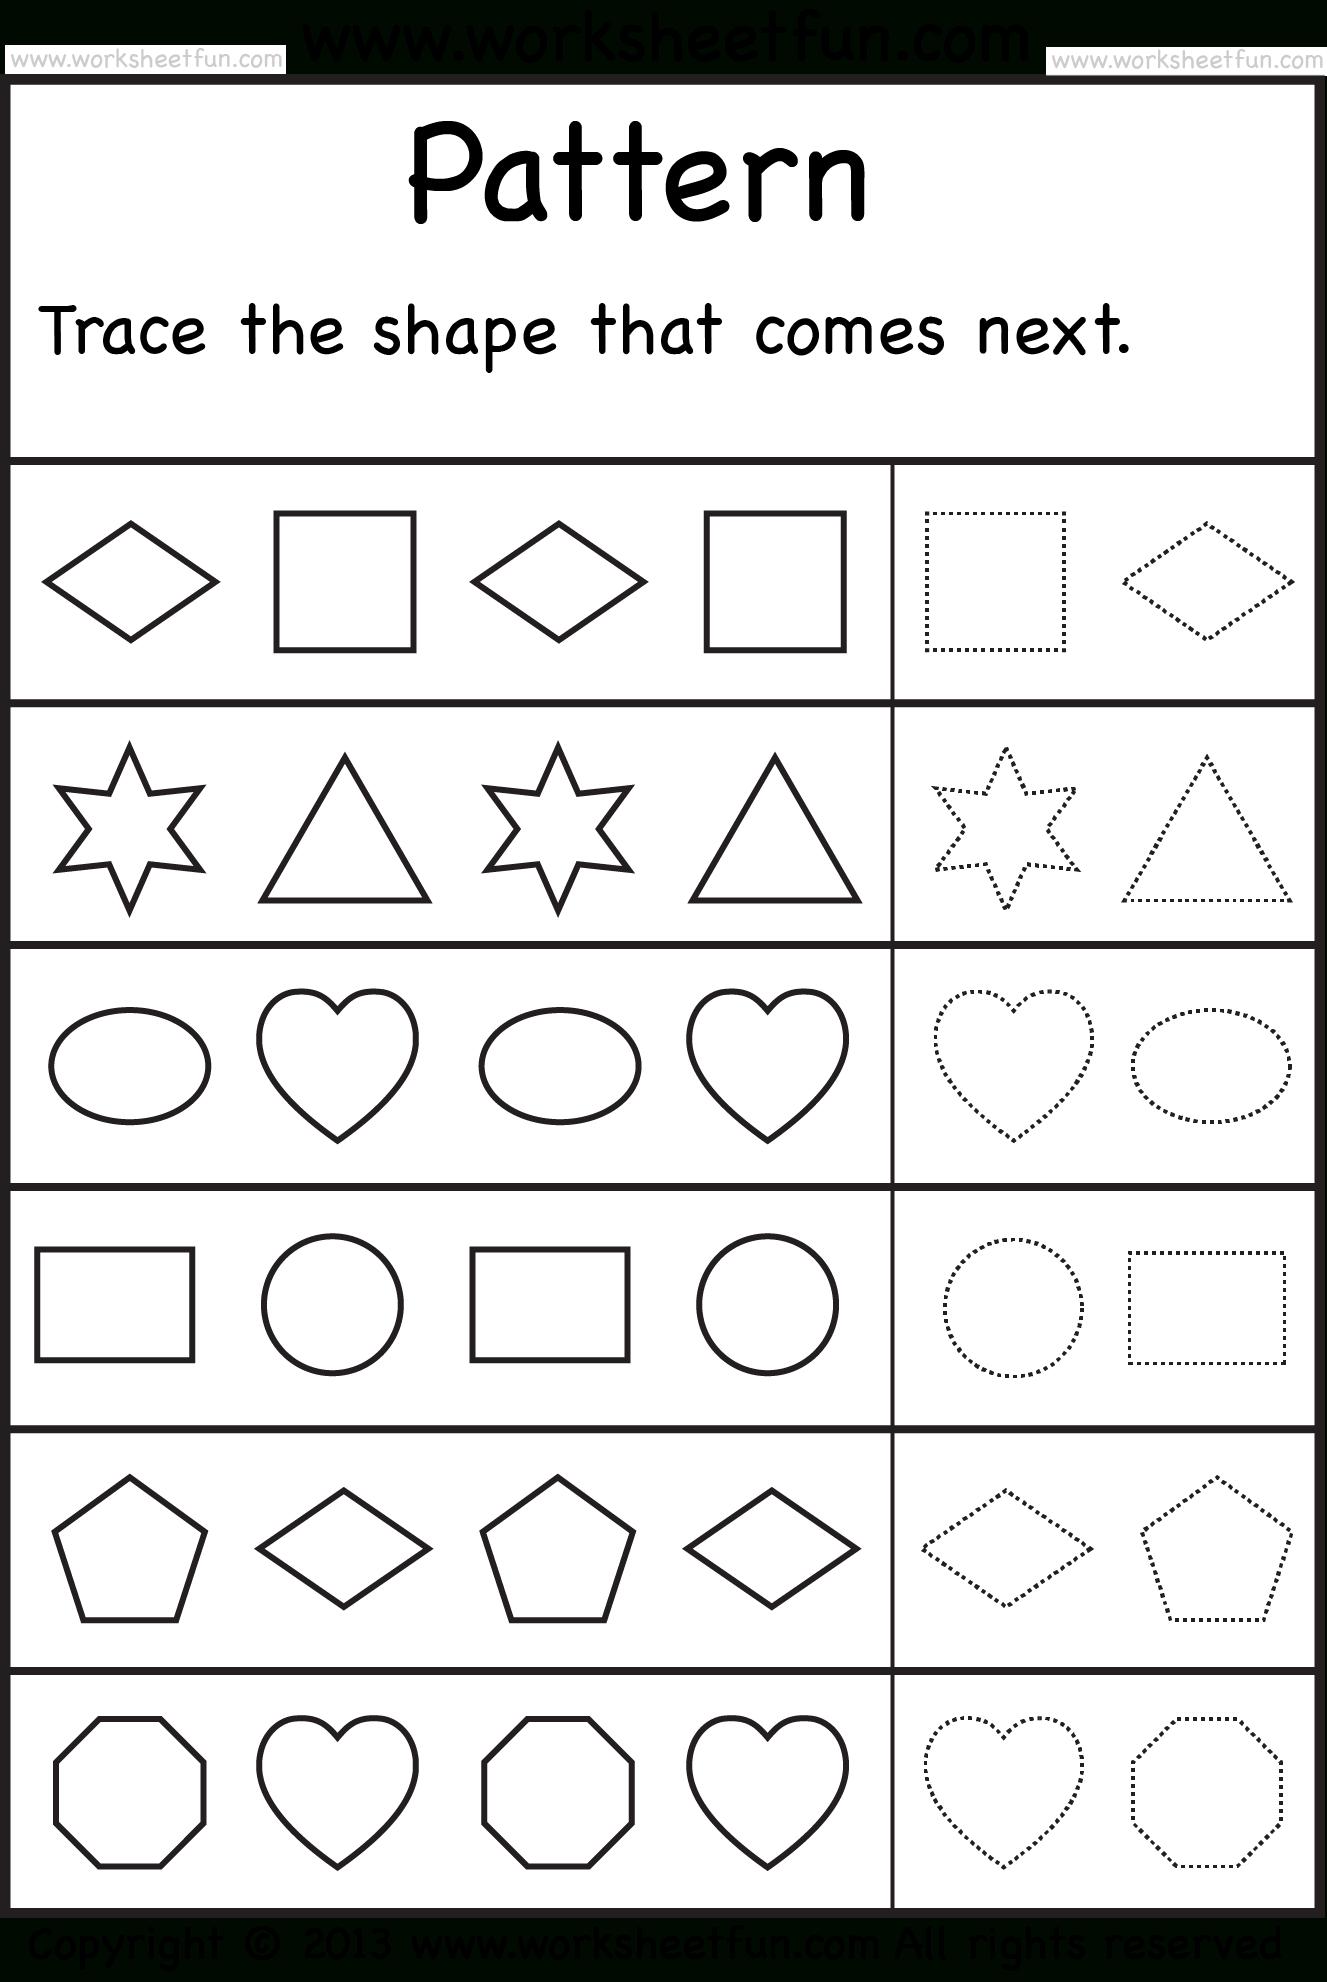 Amazing Preschooleets Pattern Pattern_What Comes Next_Wfun_2